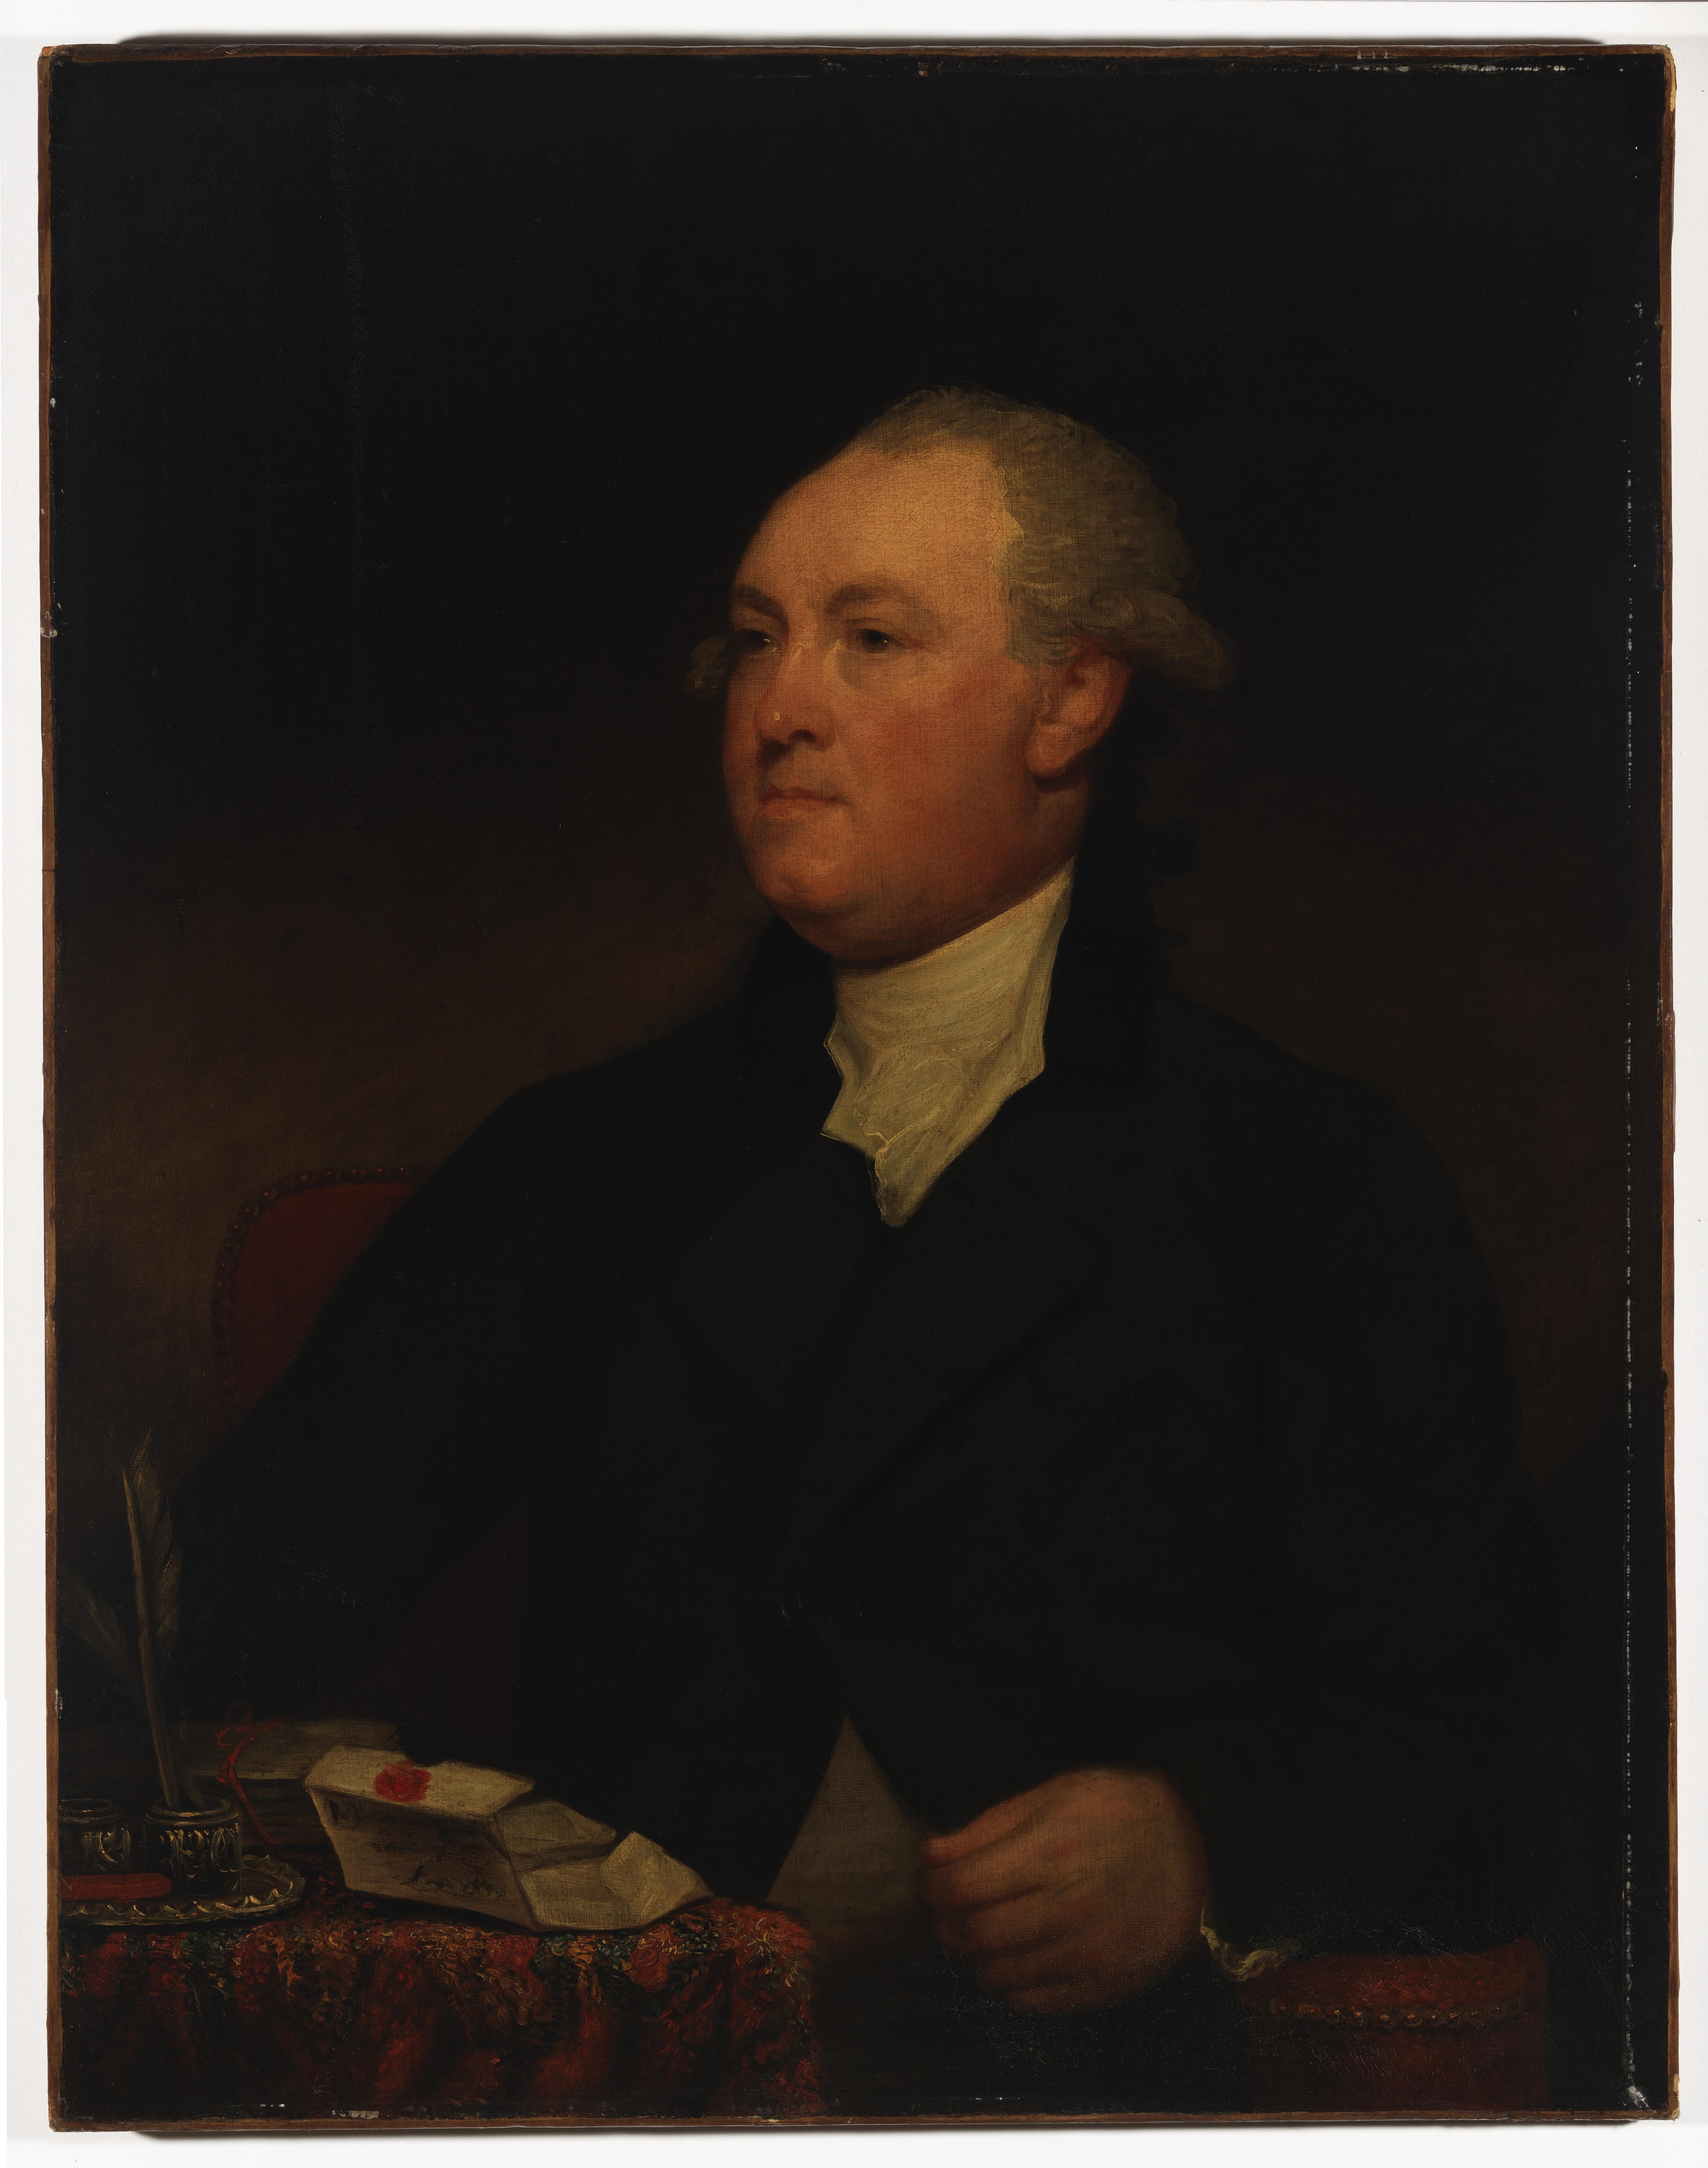 Thomas Townshend 1st Viscount Sydney Wikipedia